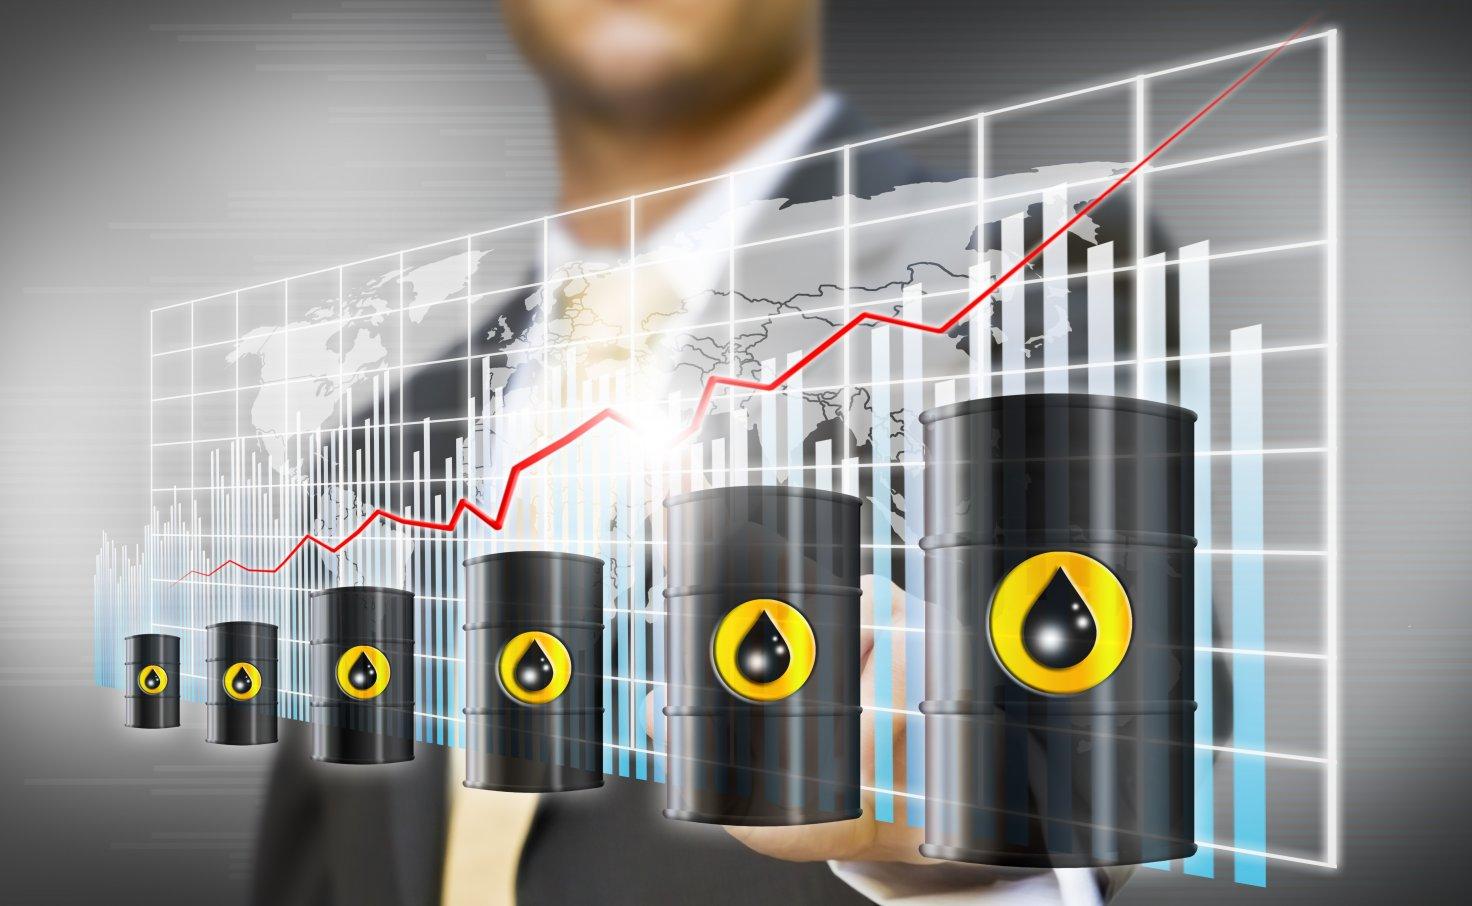 Как устроен рынок нефти   Currency.com